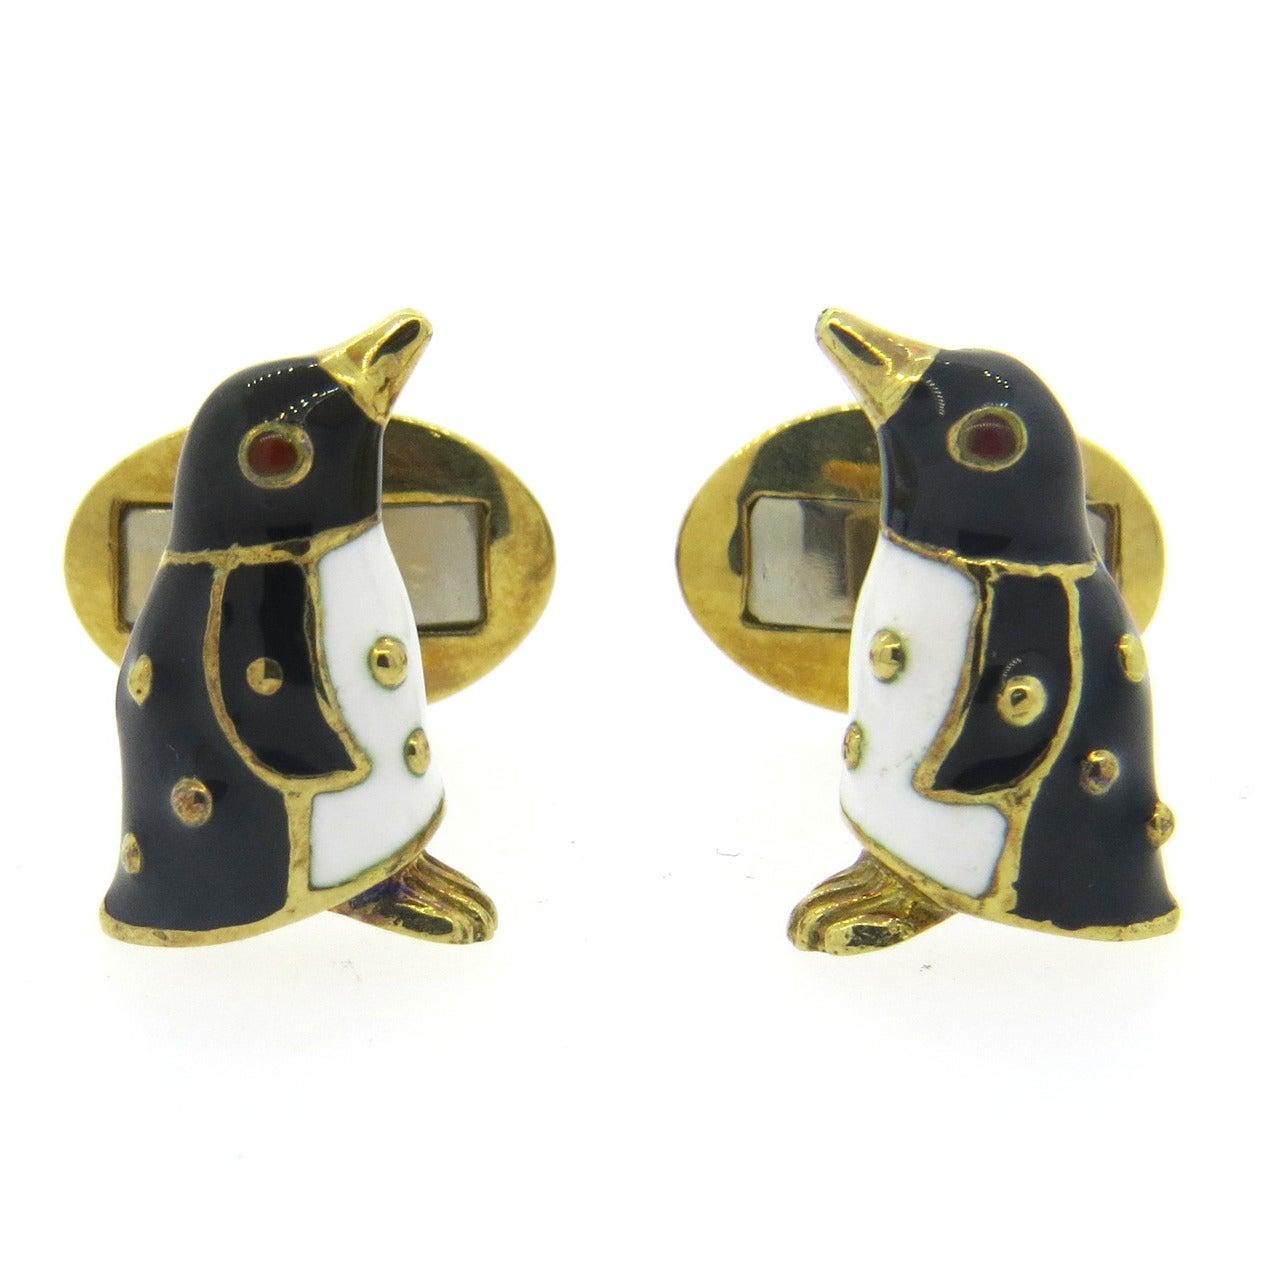 Hidalgo Gold Enamel Penguin Cufflinks For Sale